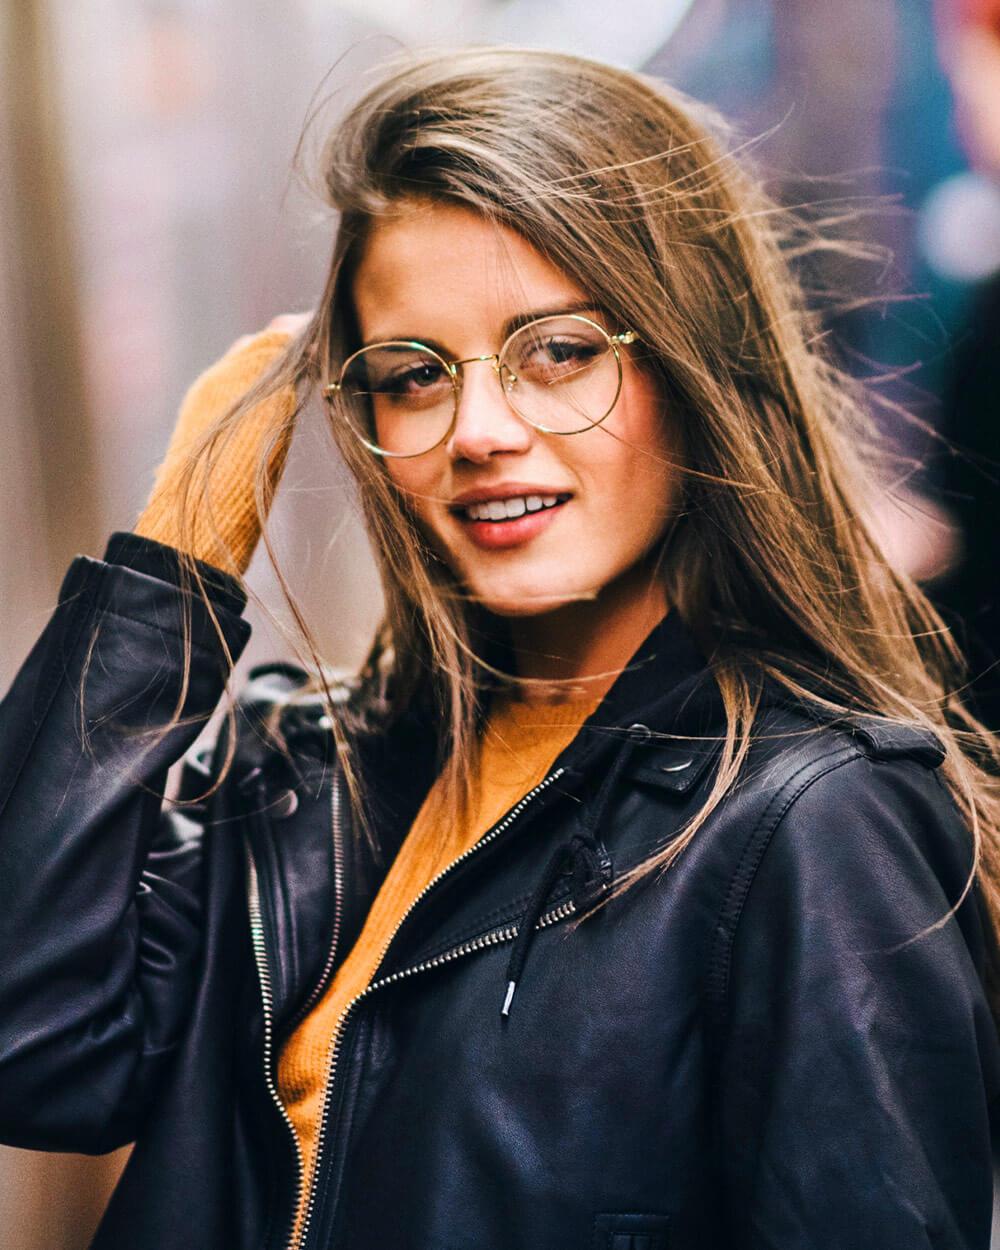 Round eyeglasses style